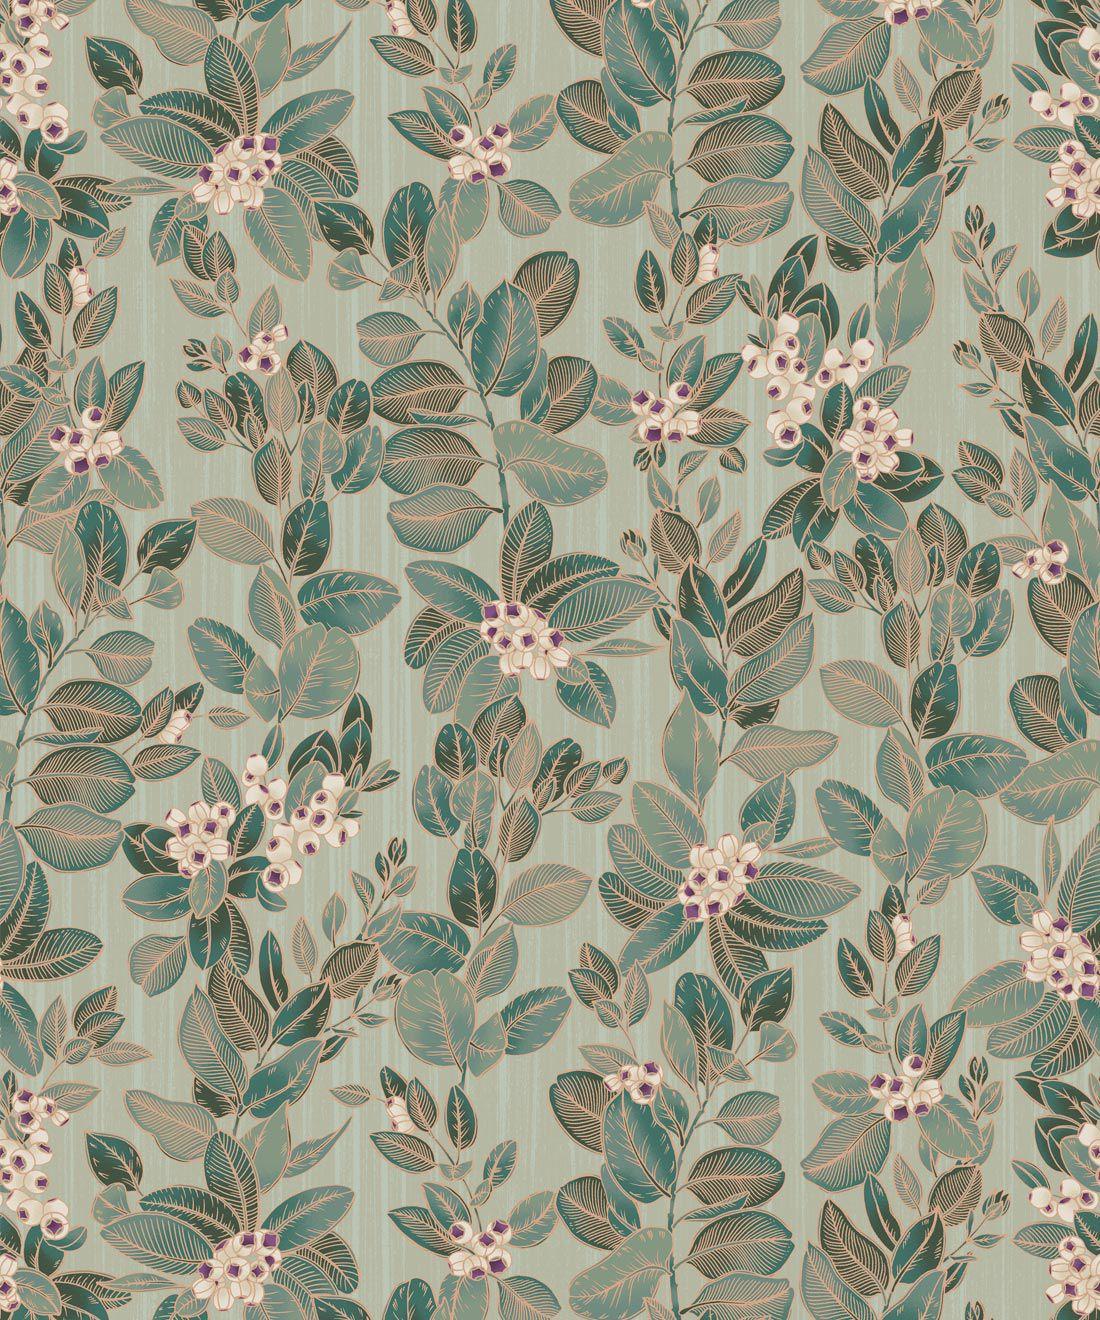 Eucalyptus Wallpaper • Eloise Short • Vintage Floral Wallpaper •Granny Chic Wallpaper • Grandmillennial Style Wallpaper •Pale Green •Swatch